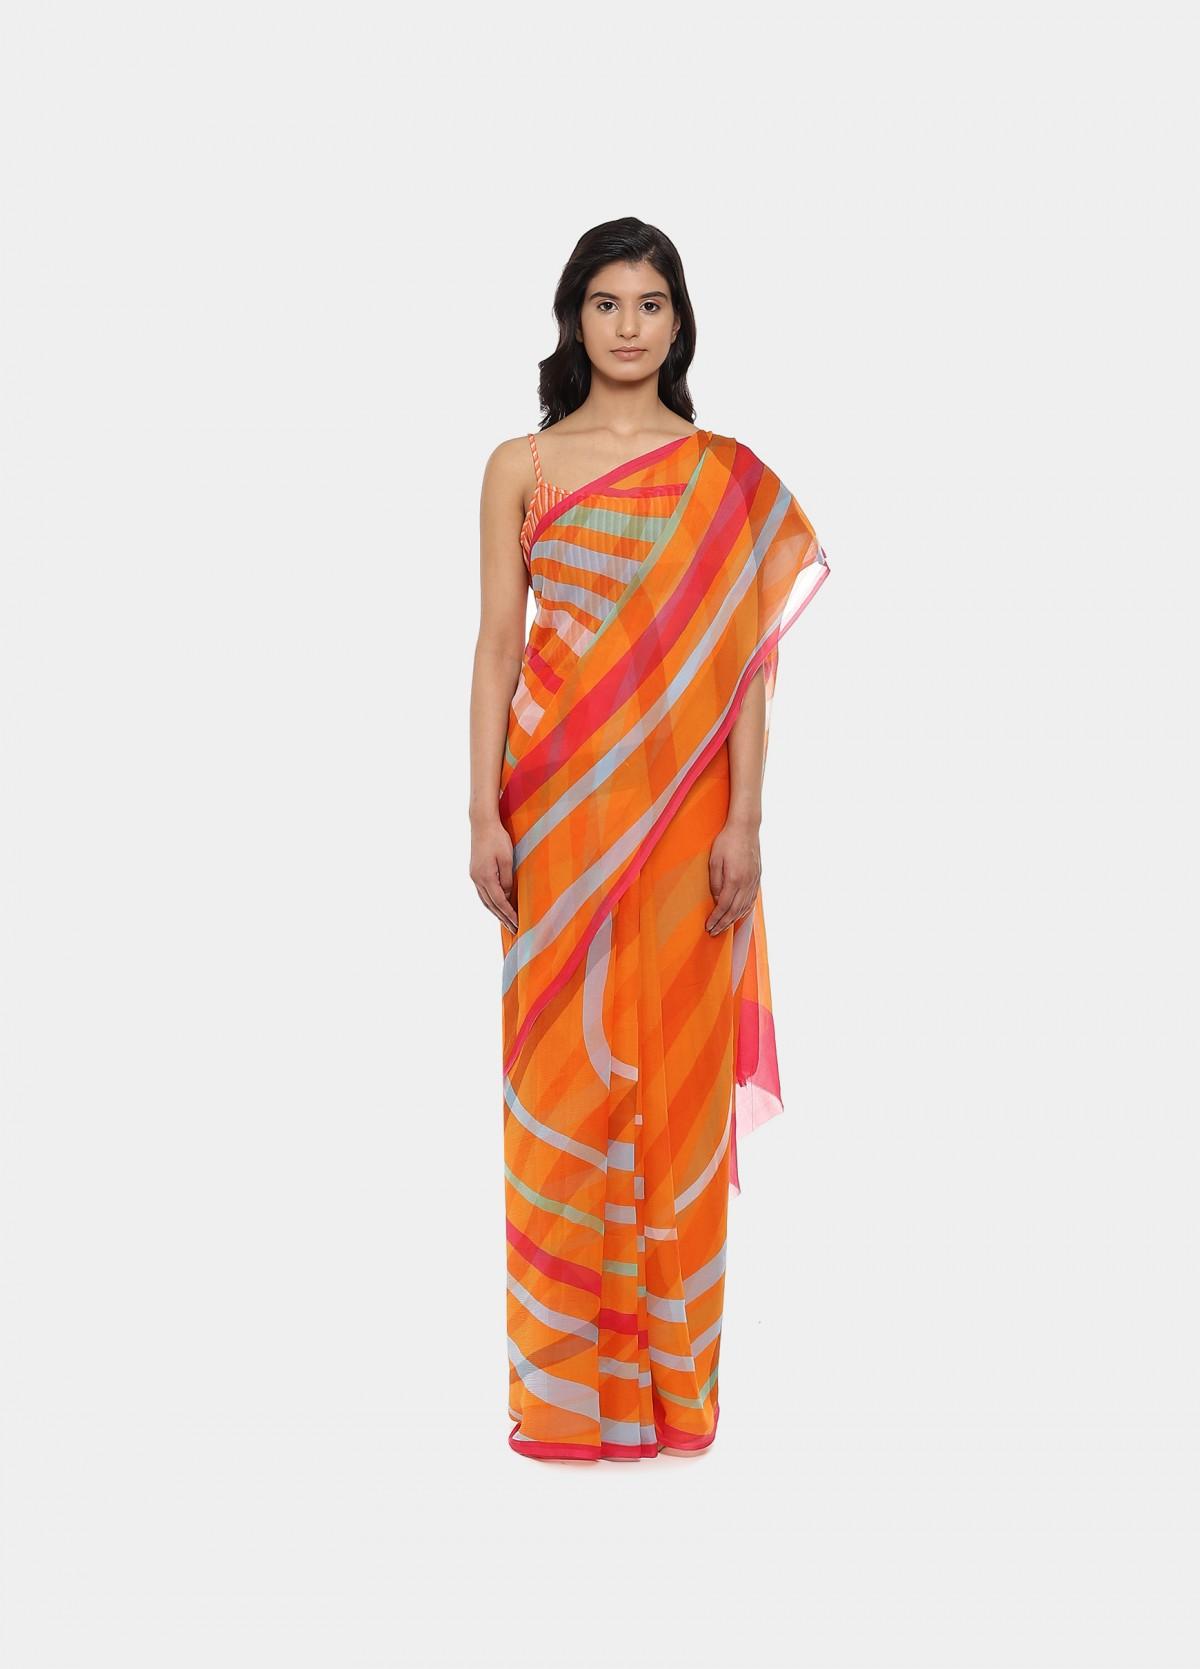 The Rave Sari